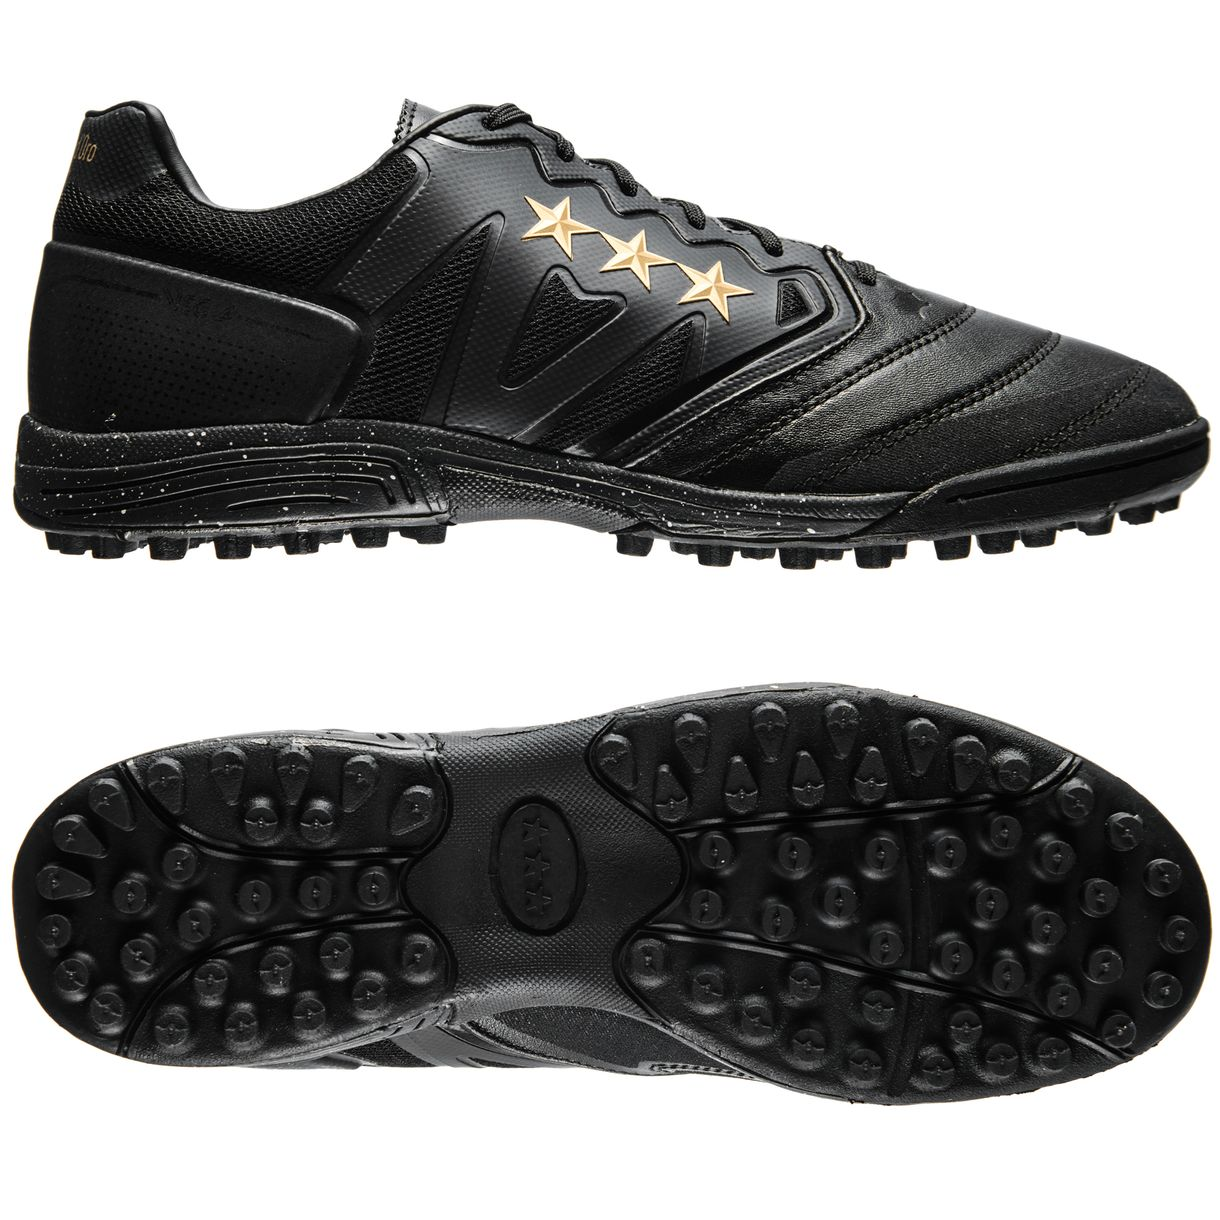 pantofola d 39 oro vega ultima tf black gold rush equipment football shirt blog. Black Bedroom Furniture Sets. Home Design Ideas